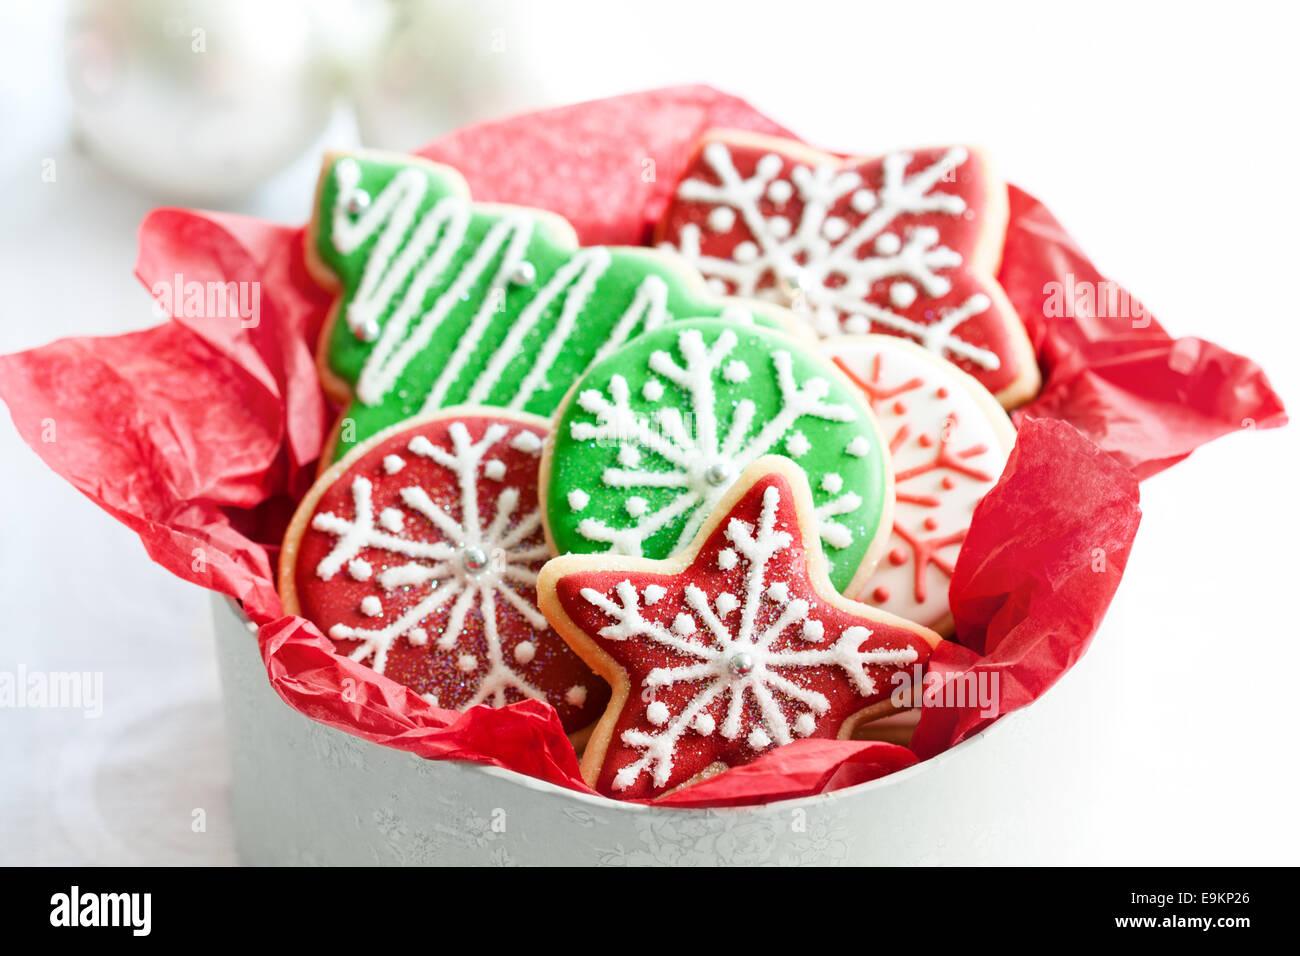 Gift box of Christmas cookies Stock Photo: 74807774 - Alamy